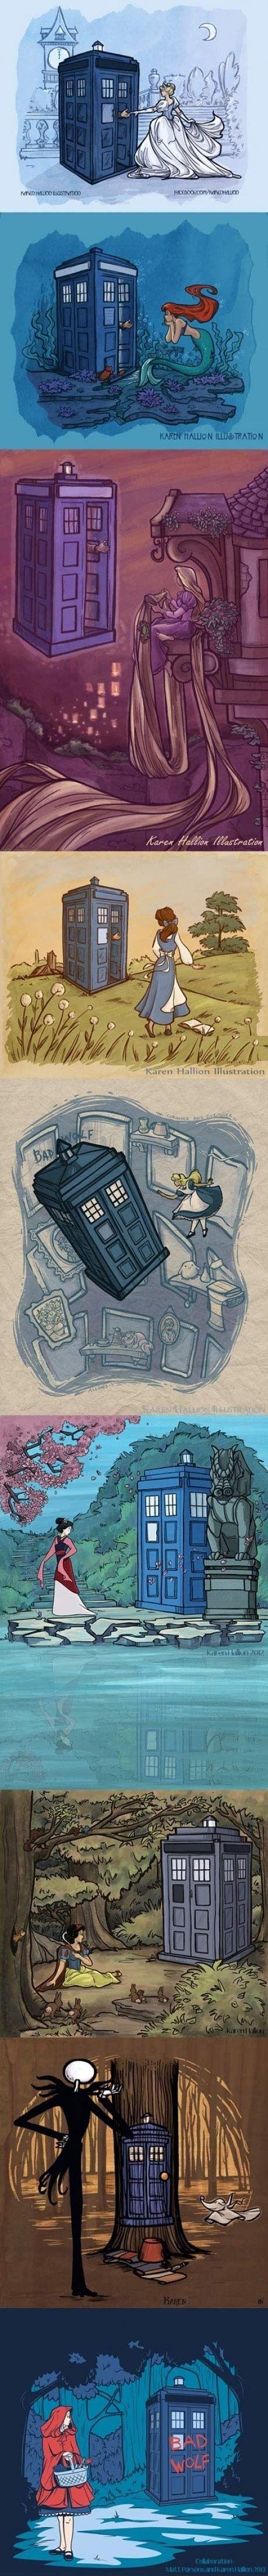 Doctor Who Hitting on Disney Princesses